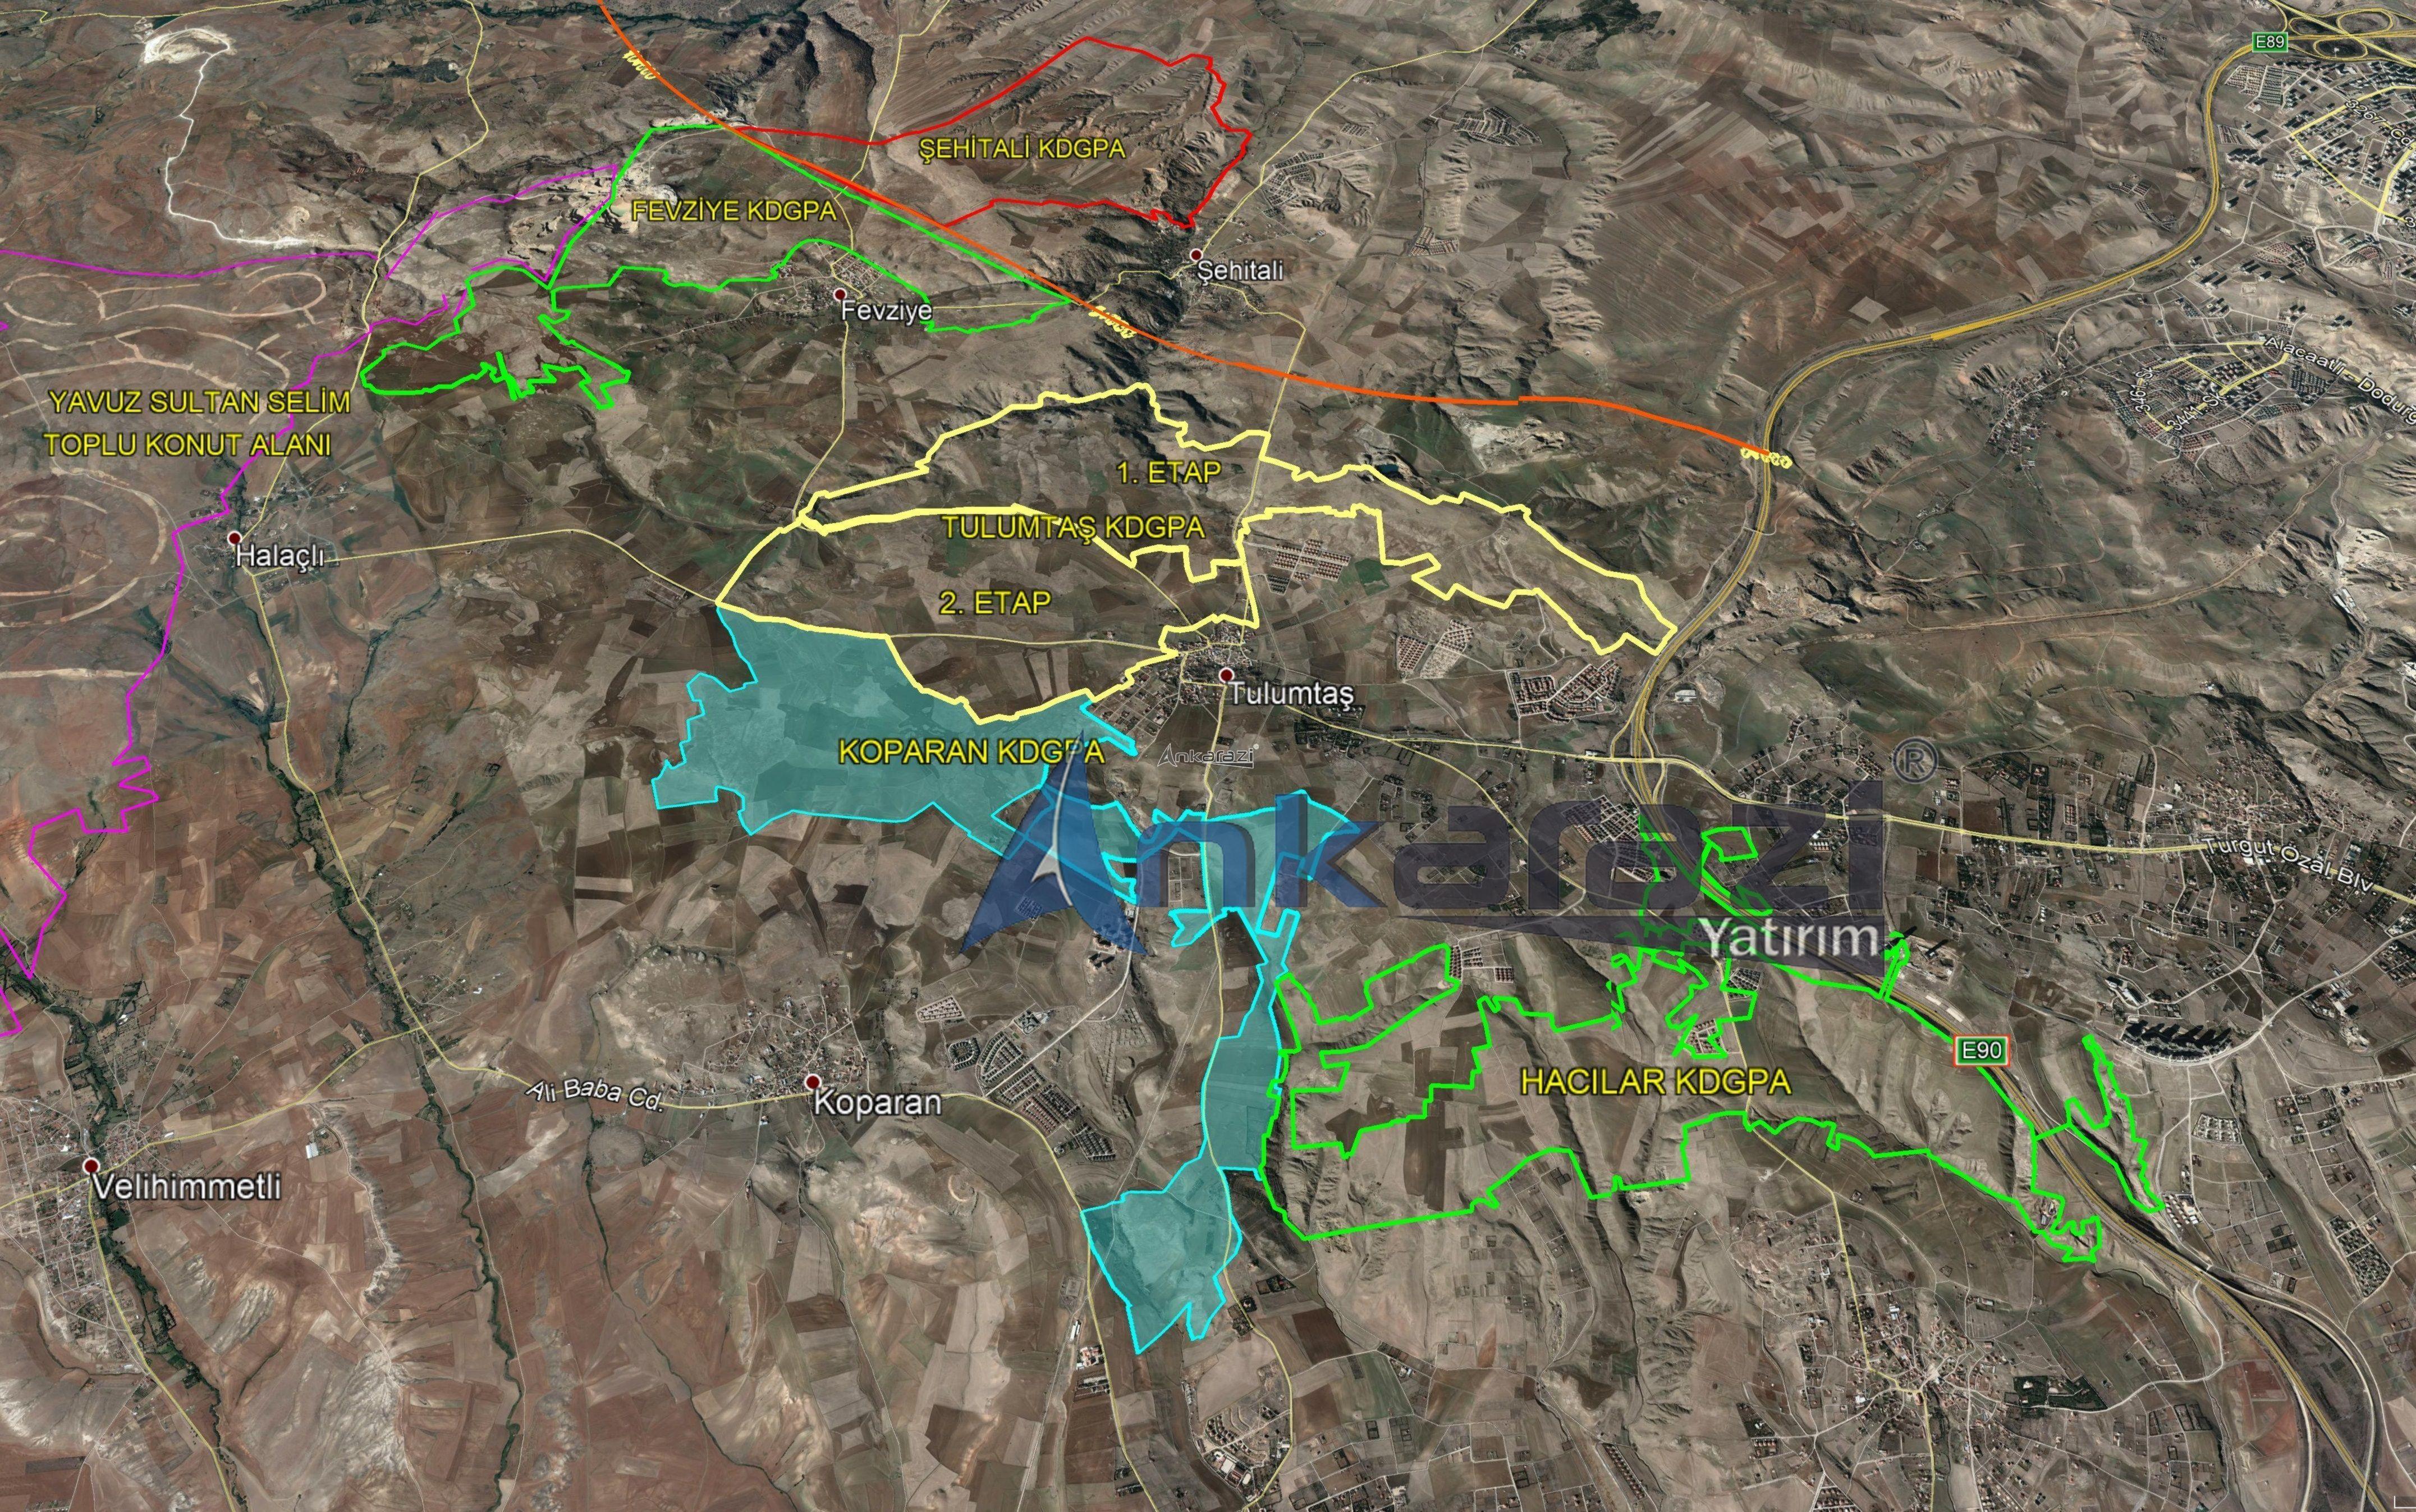 Koparan - Tulumtaş KDGPA Sınırları... 3347